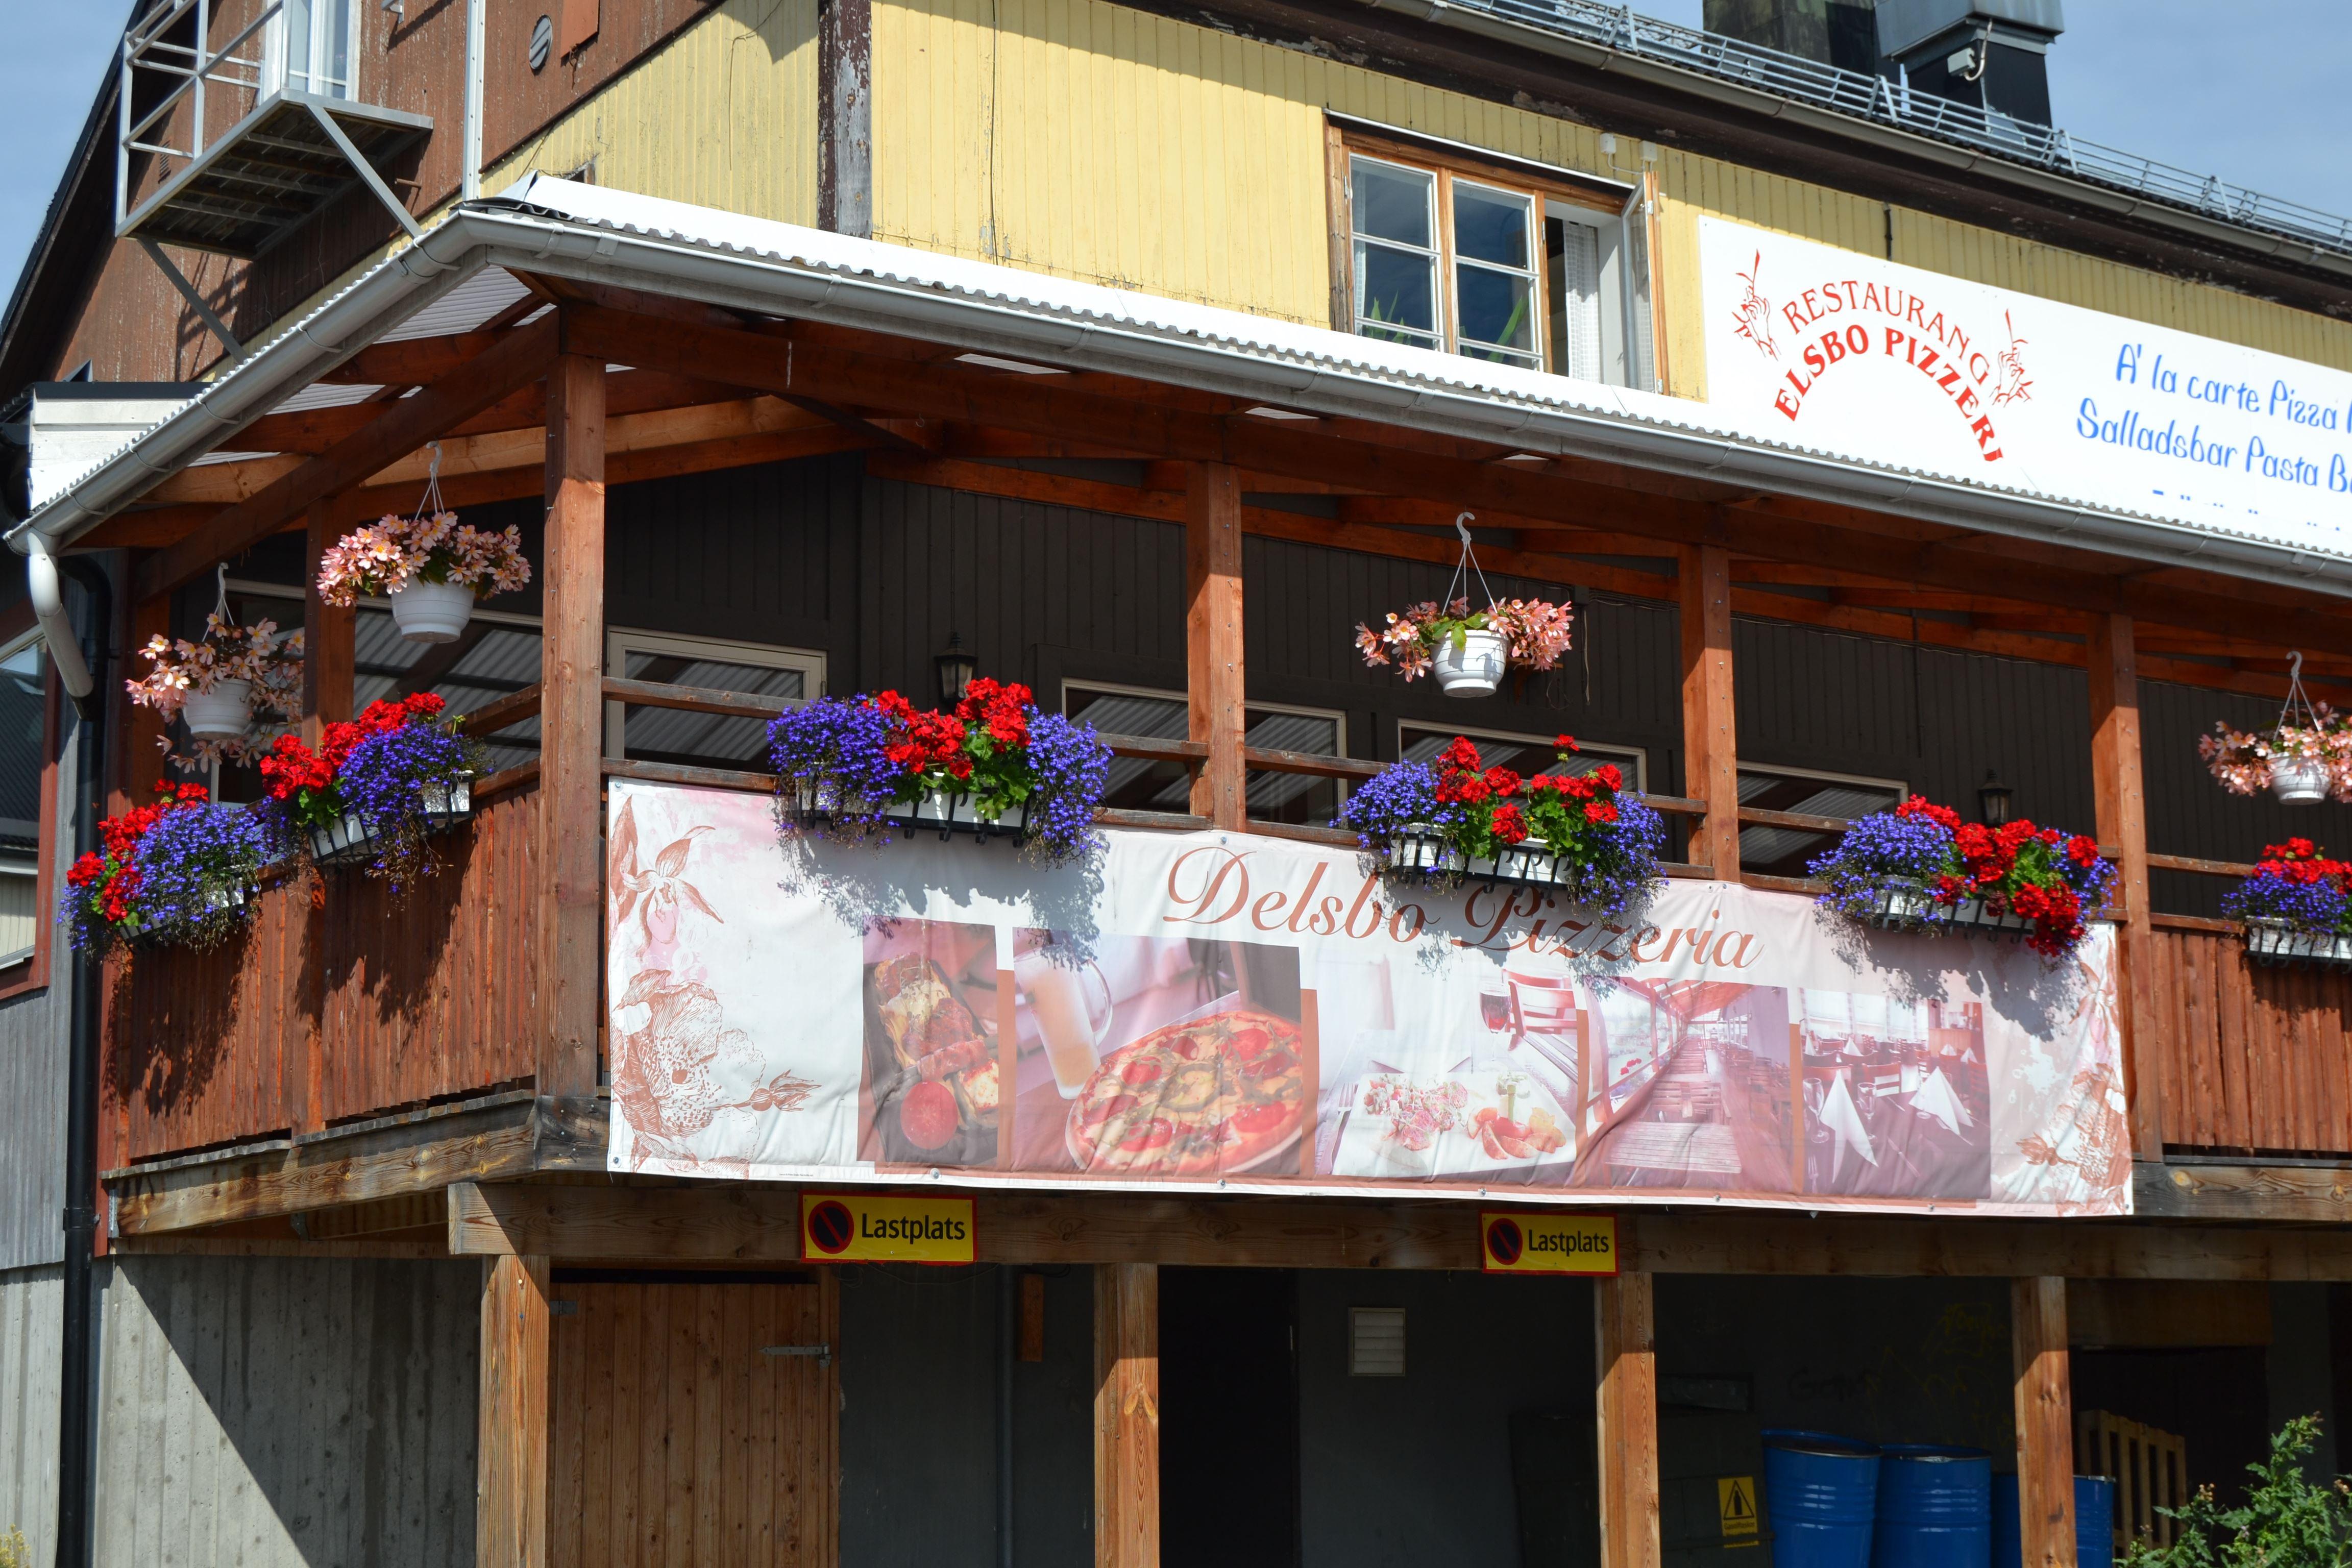 © Visit Glada Hudik, Delsbo Pizzeria - Restaurang Svea